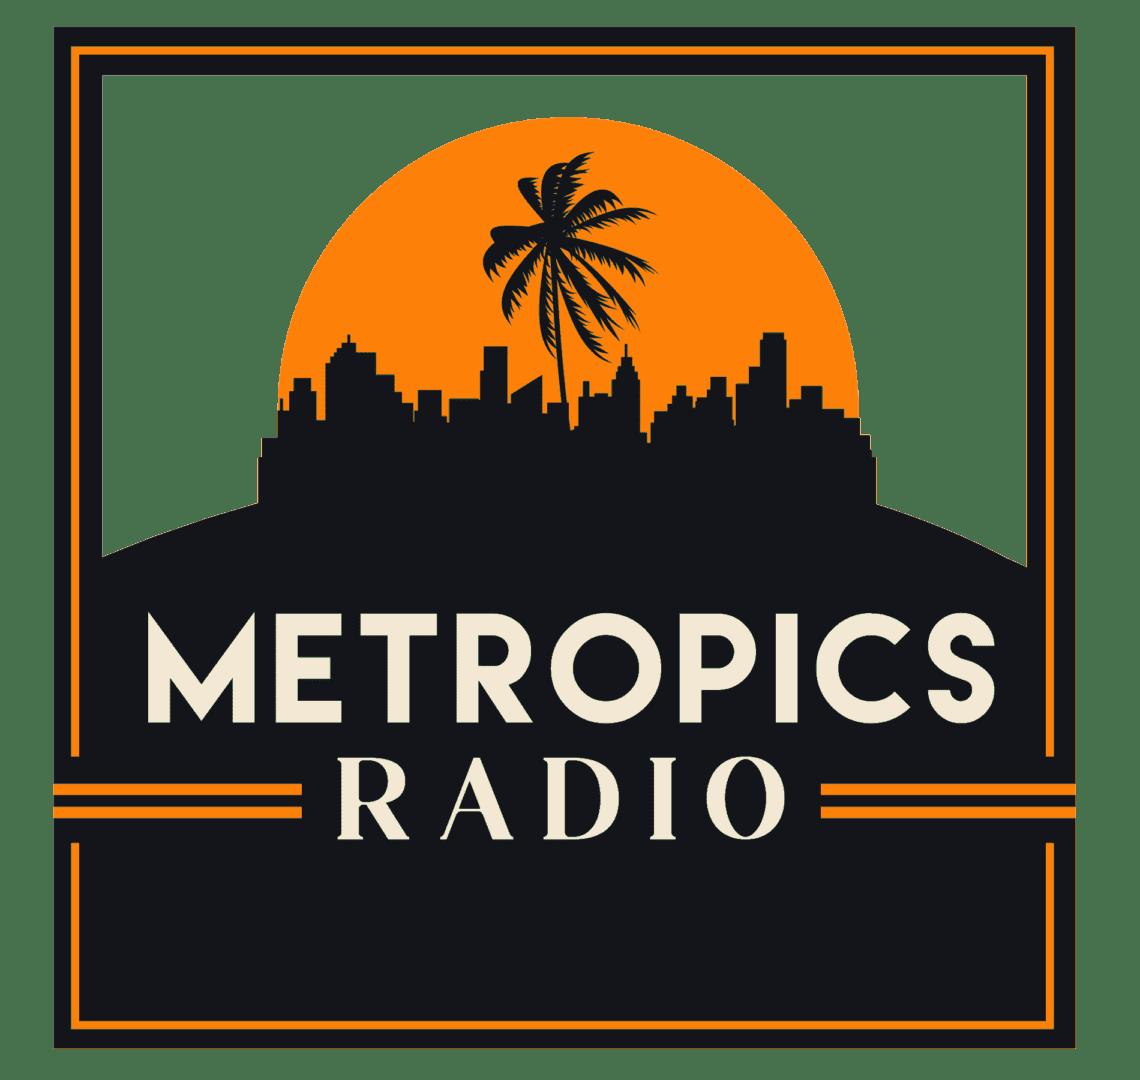 41434615_Metropics-Radio_Orange+White (624a033e-9ee3-436b-8111-5c585d50ac05)